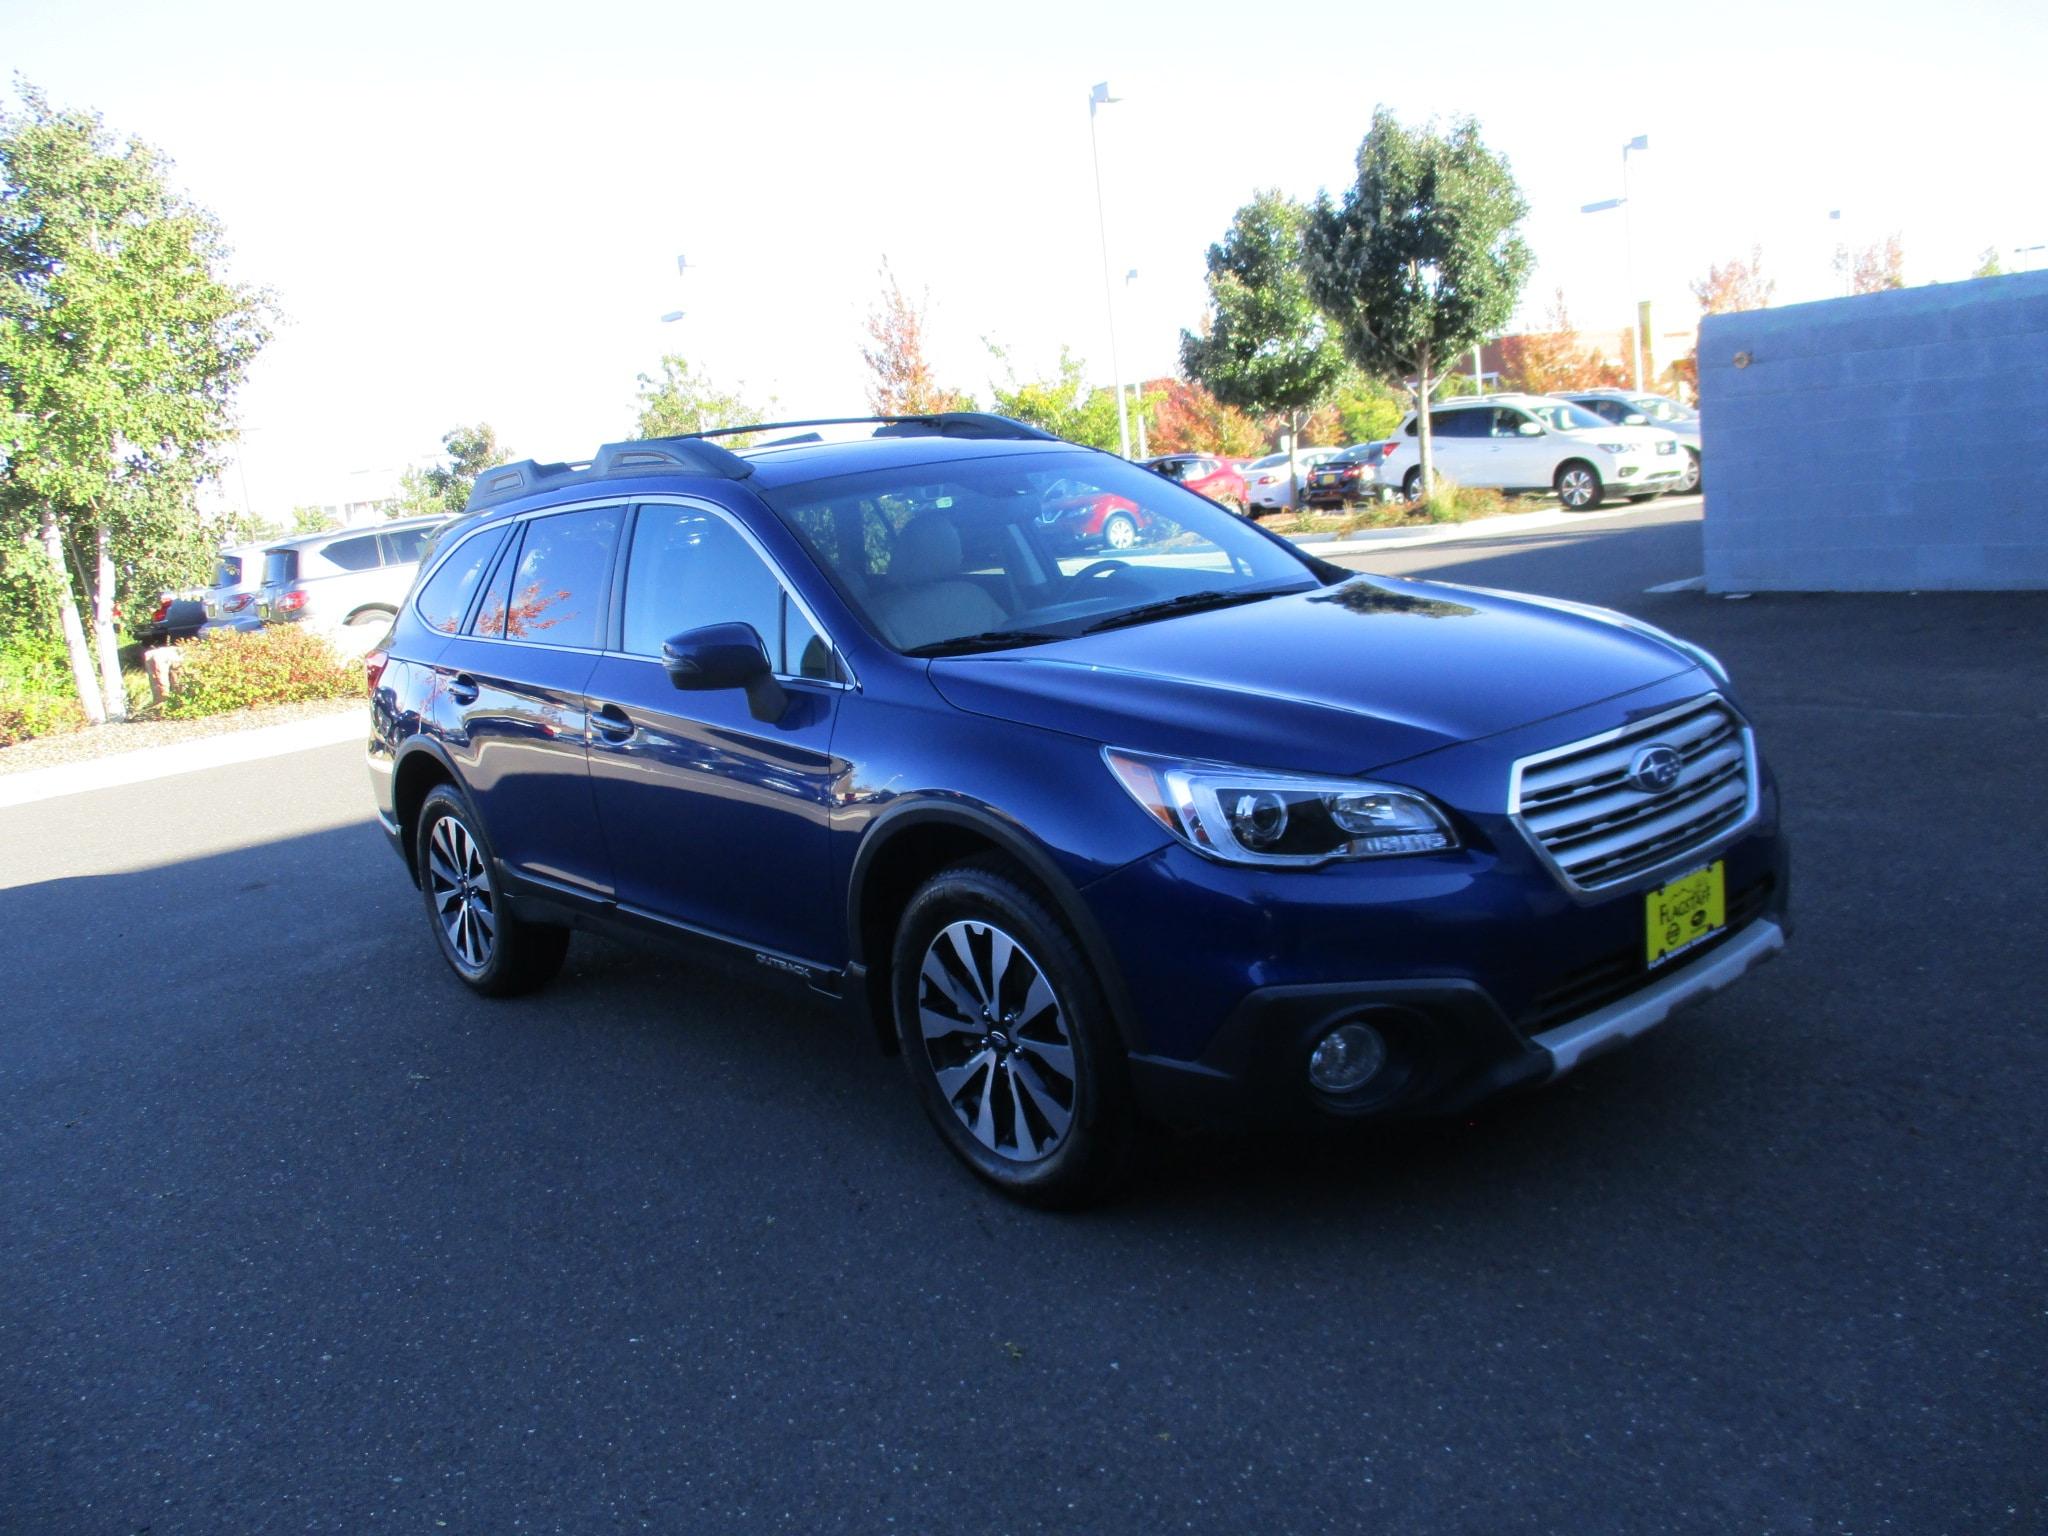 2016 Subaru Outback 2.5i Limited AWD Wagon